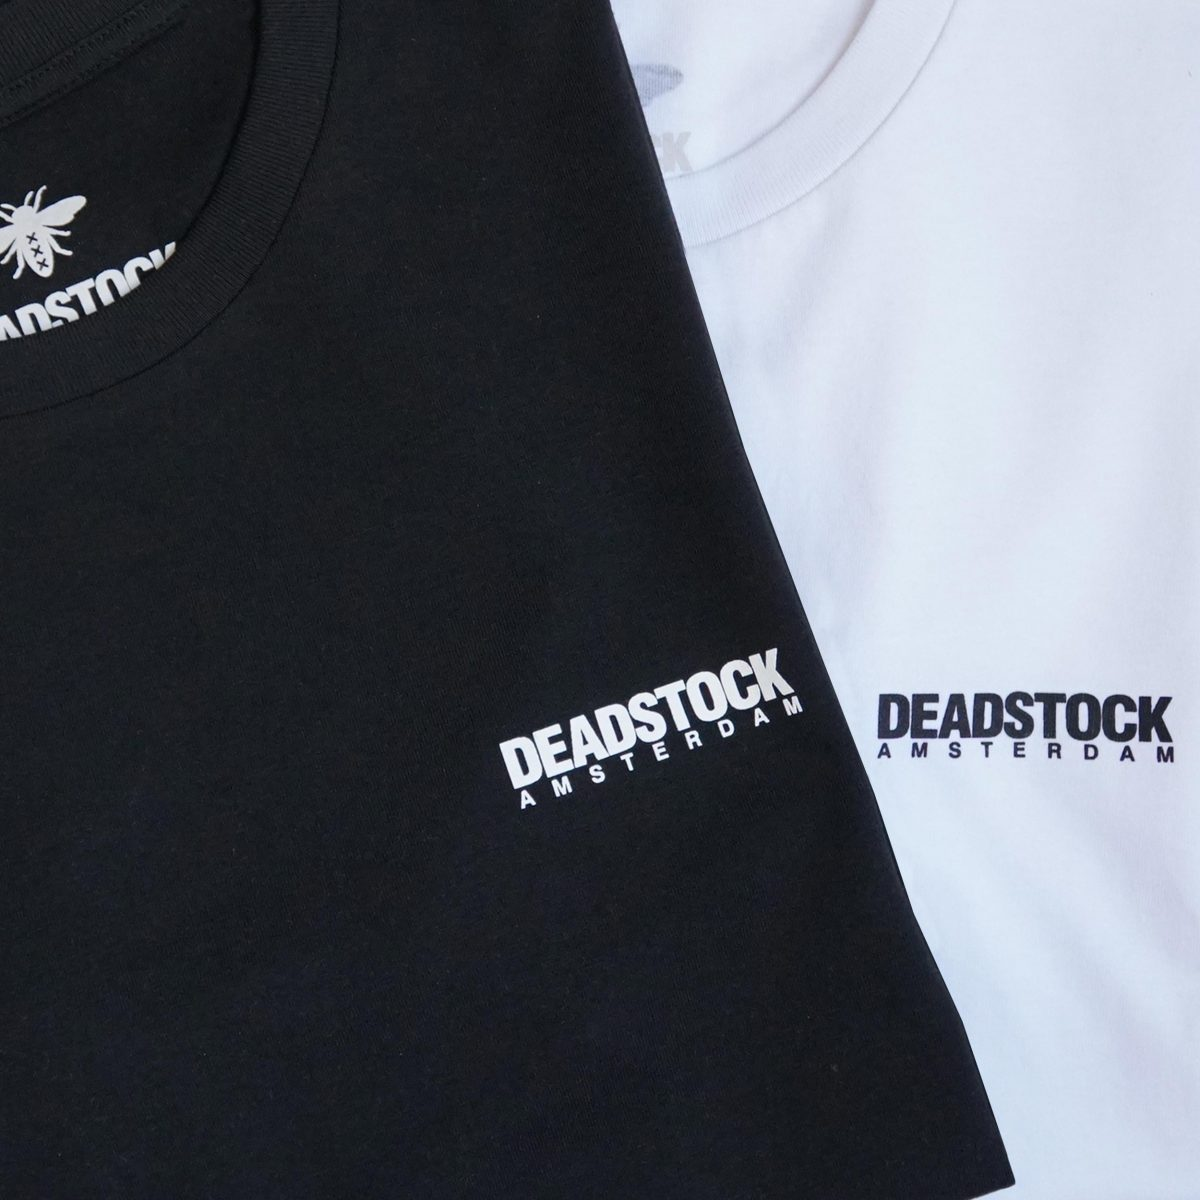 closeup-shirts-deadstock-amsterdam-return-2020